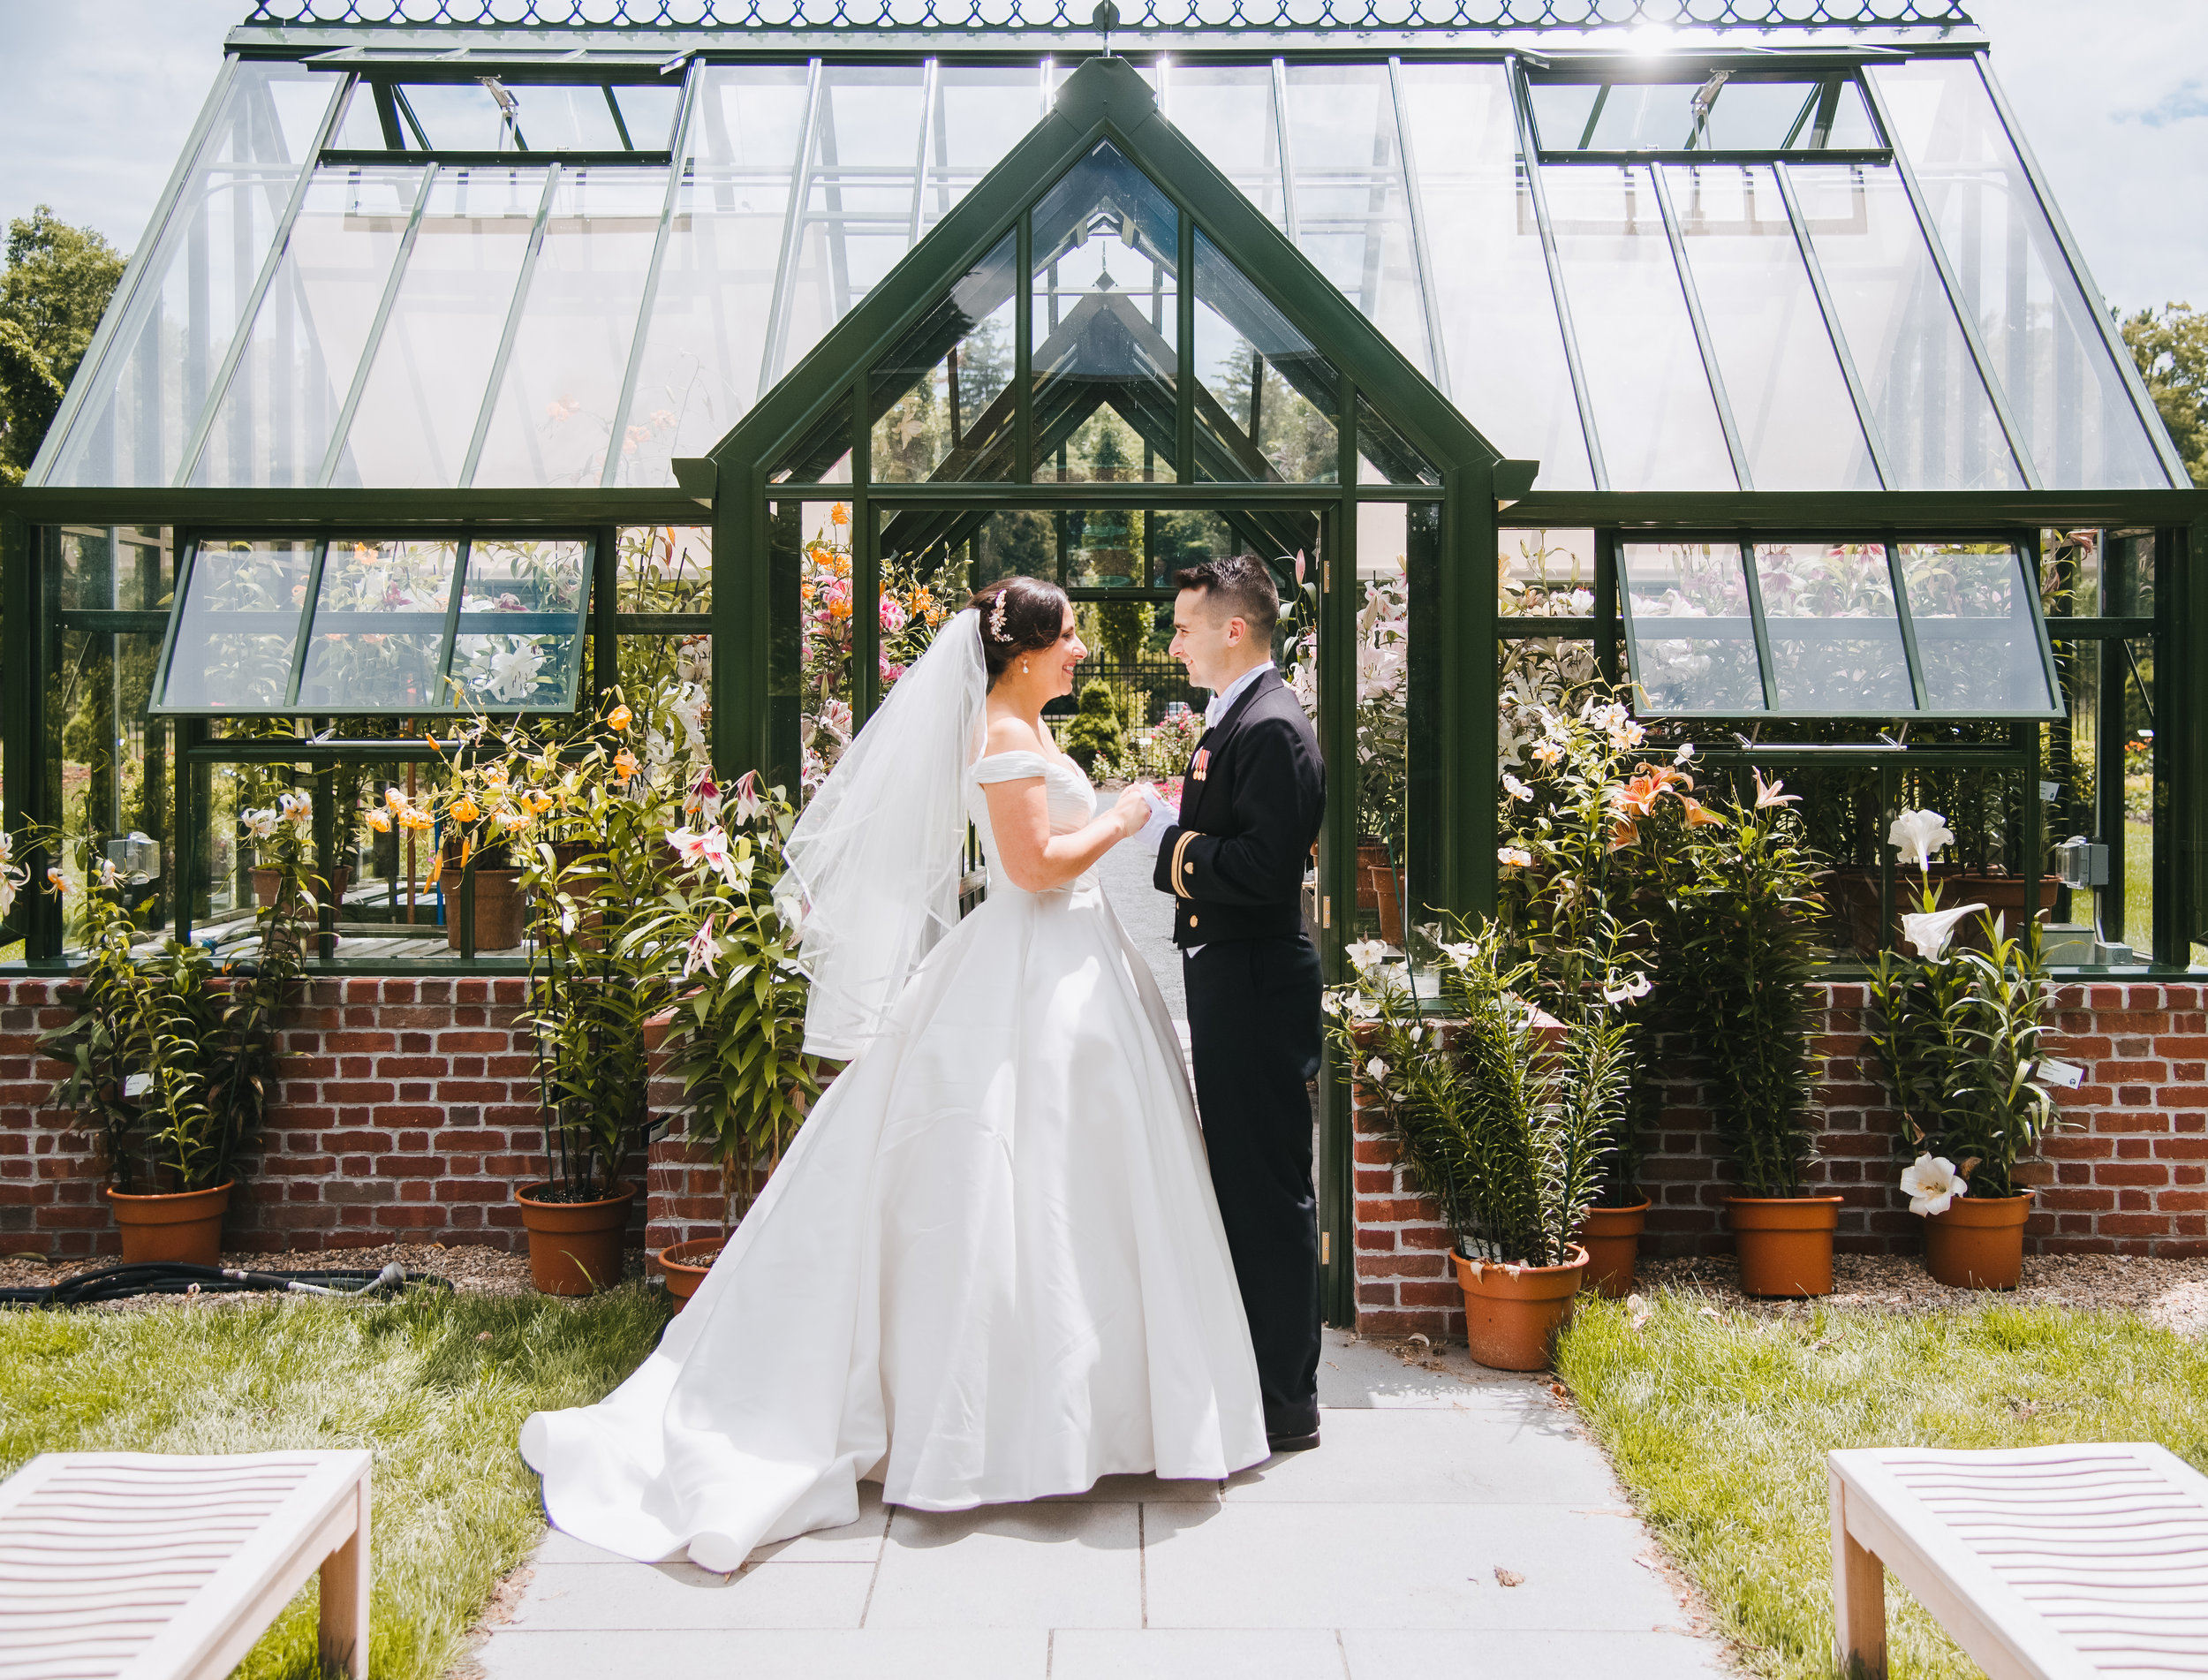 20180828_weddingwebsite_small_45.jpg